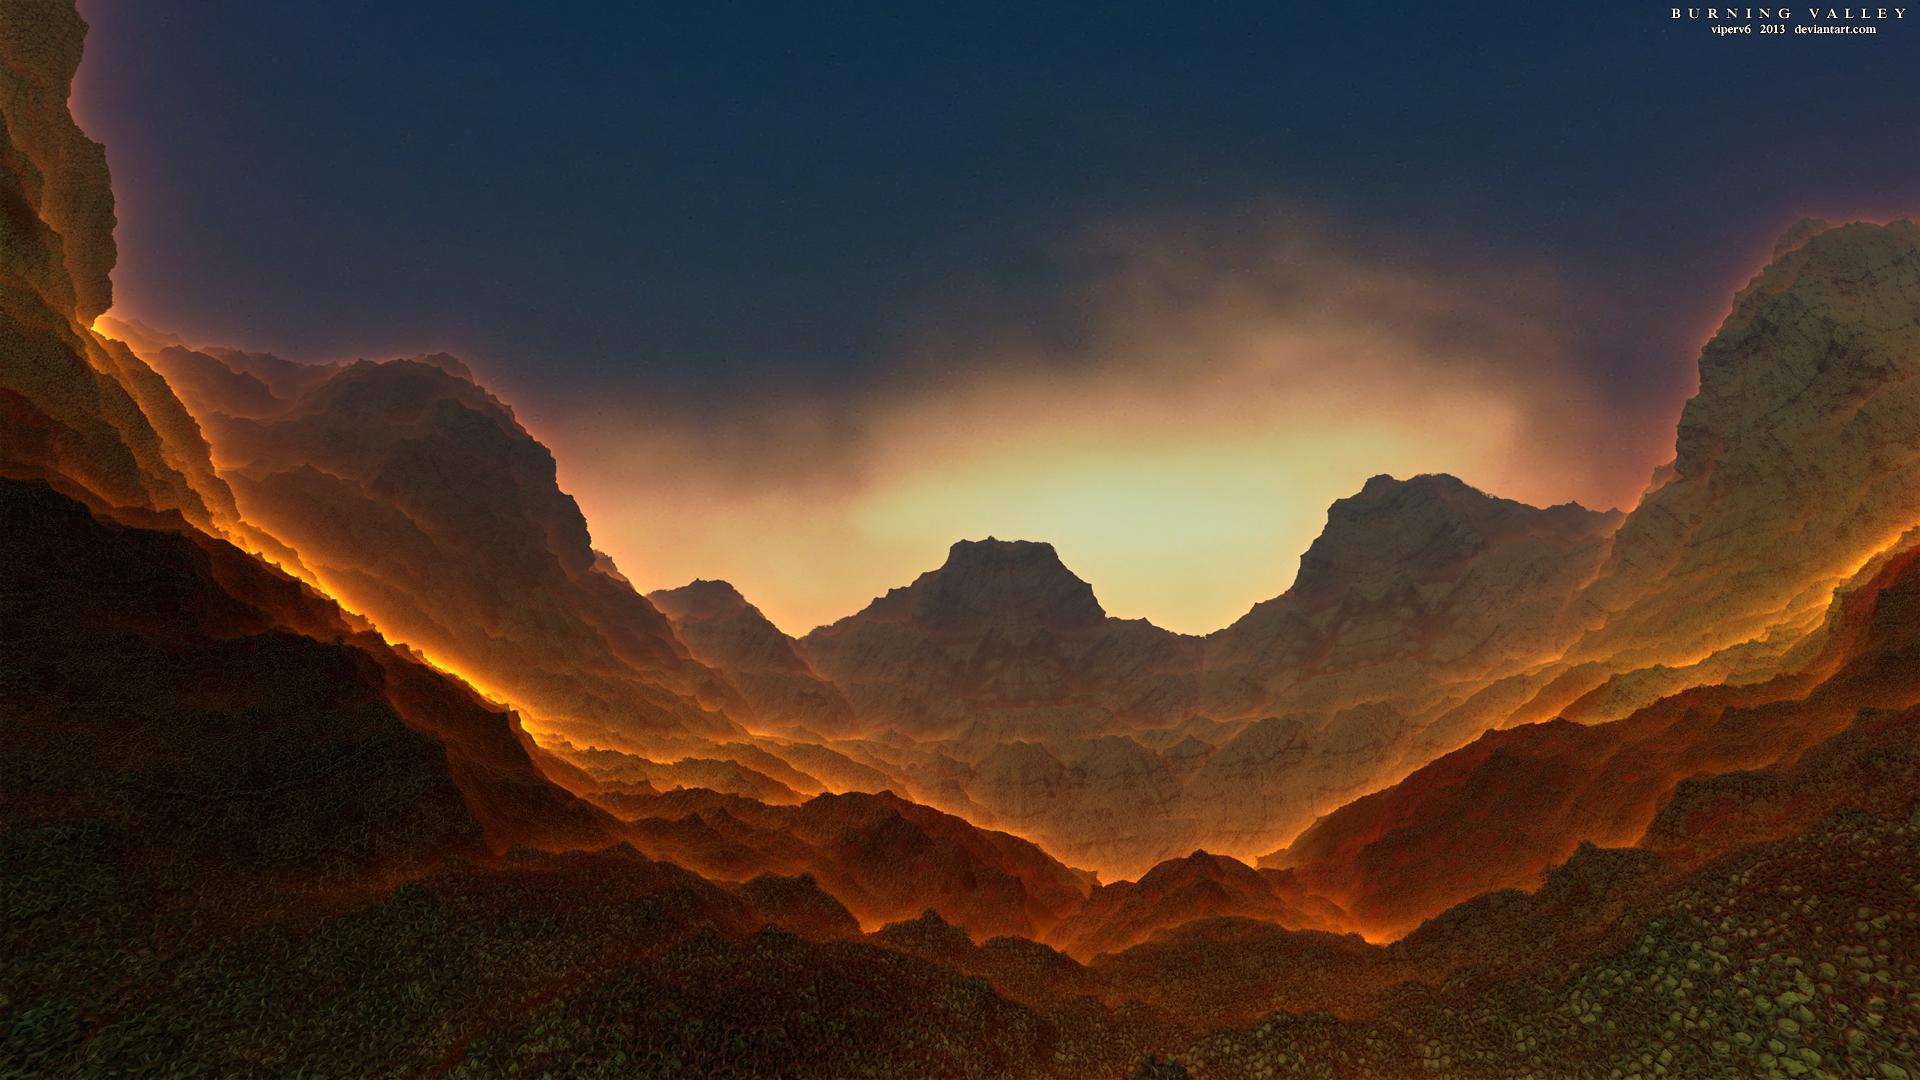 HD Wallpapers Valley Burn